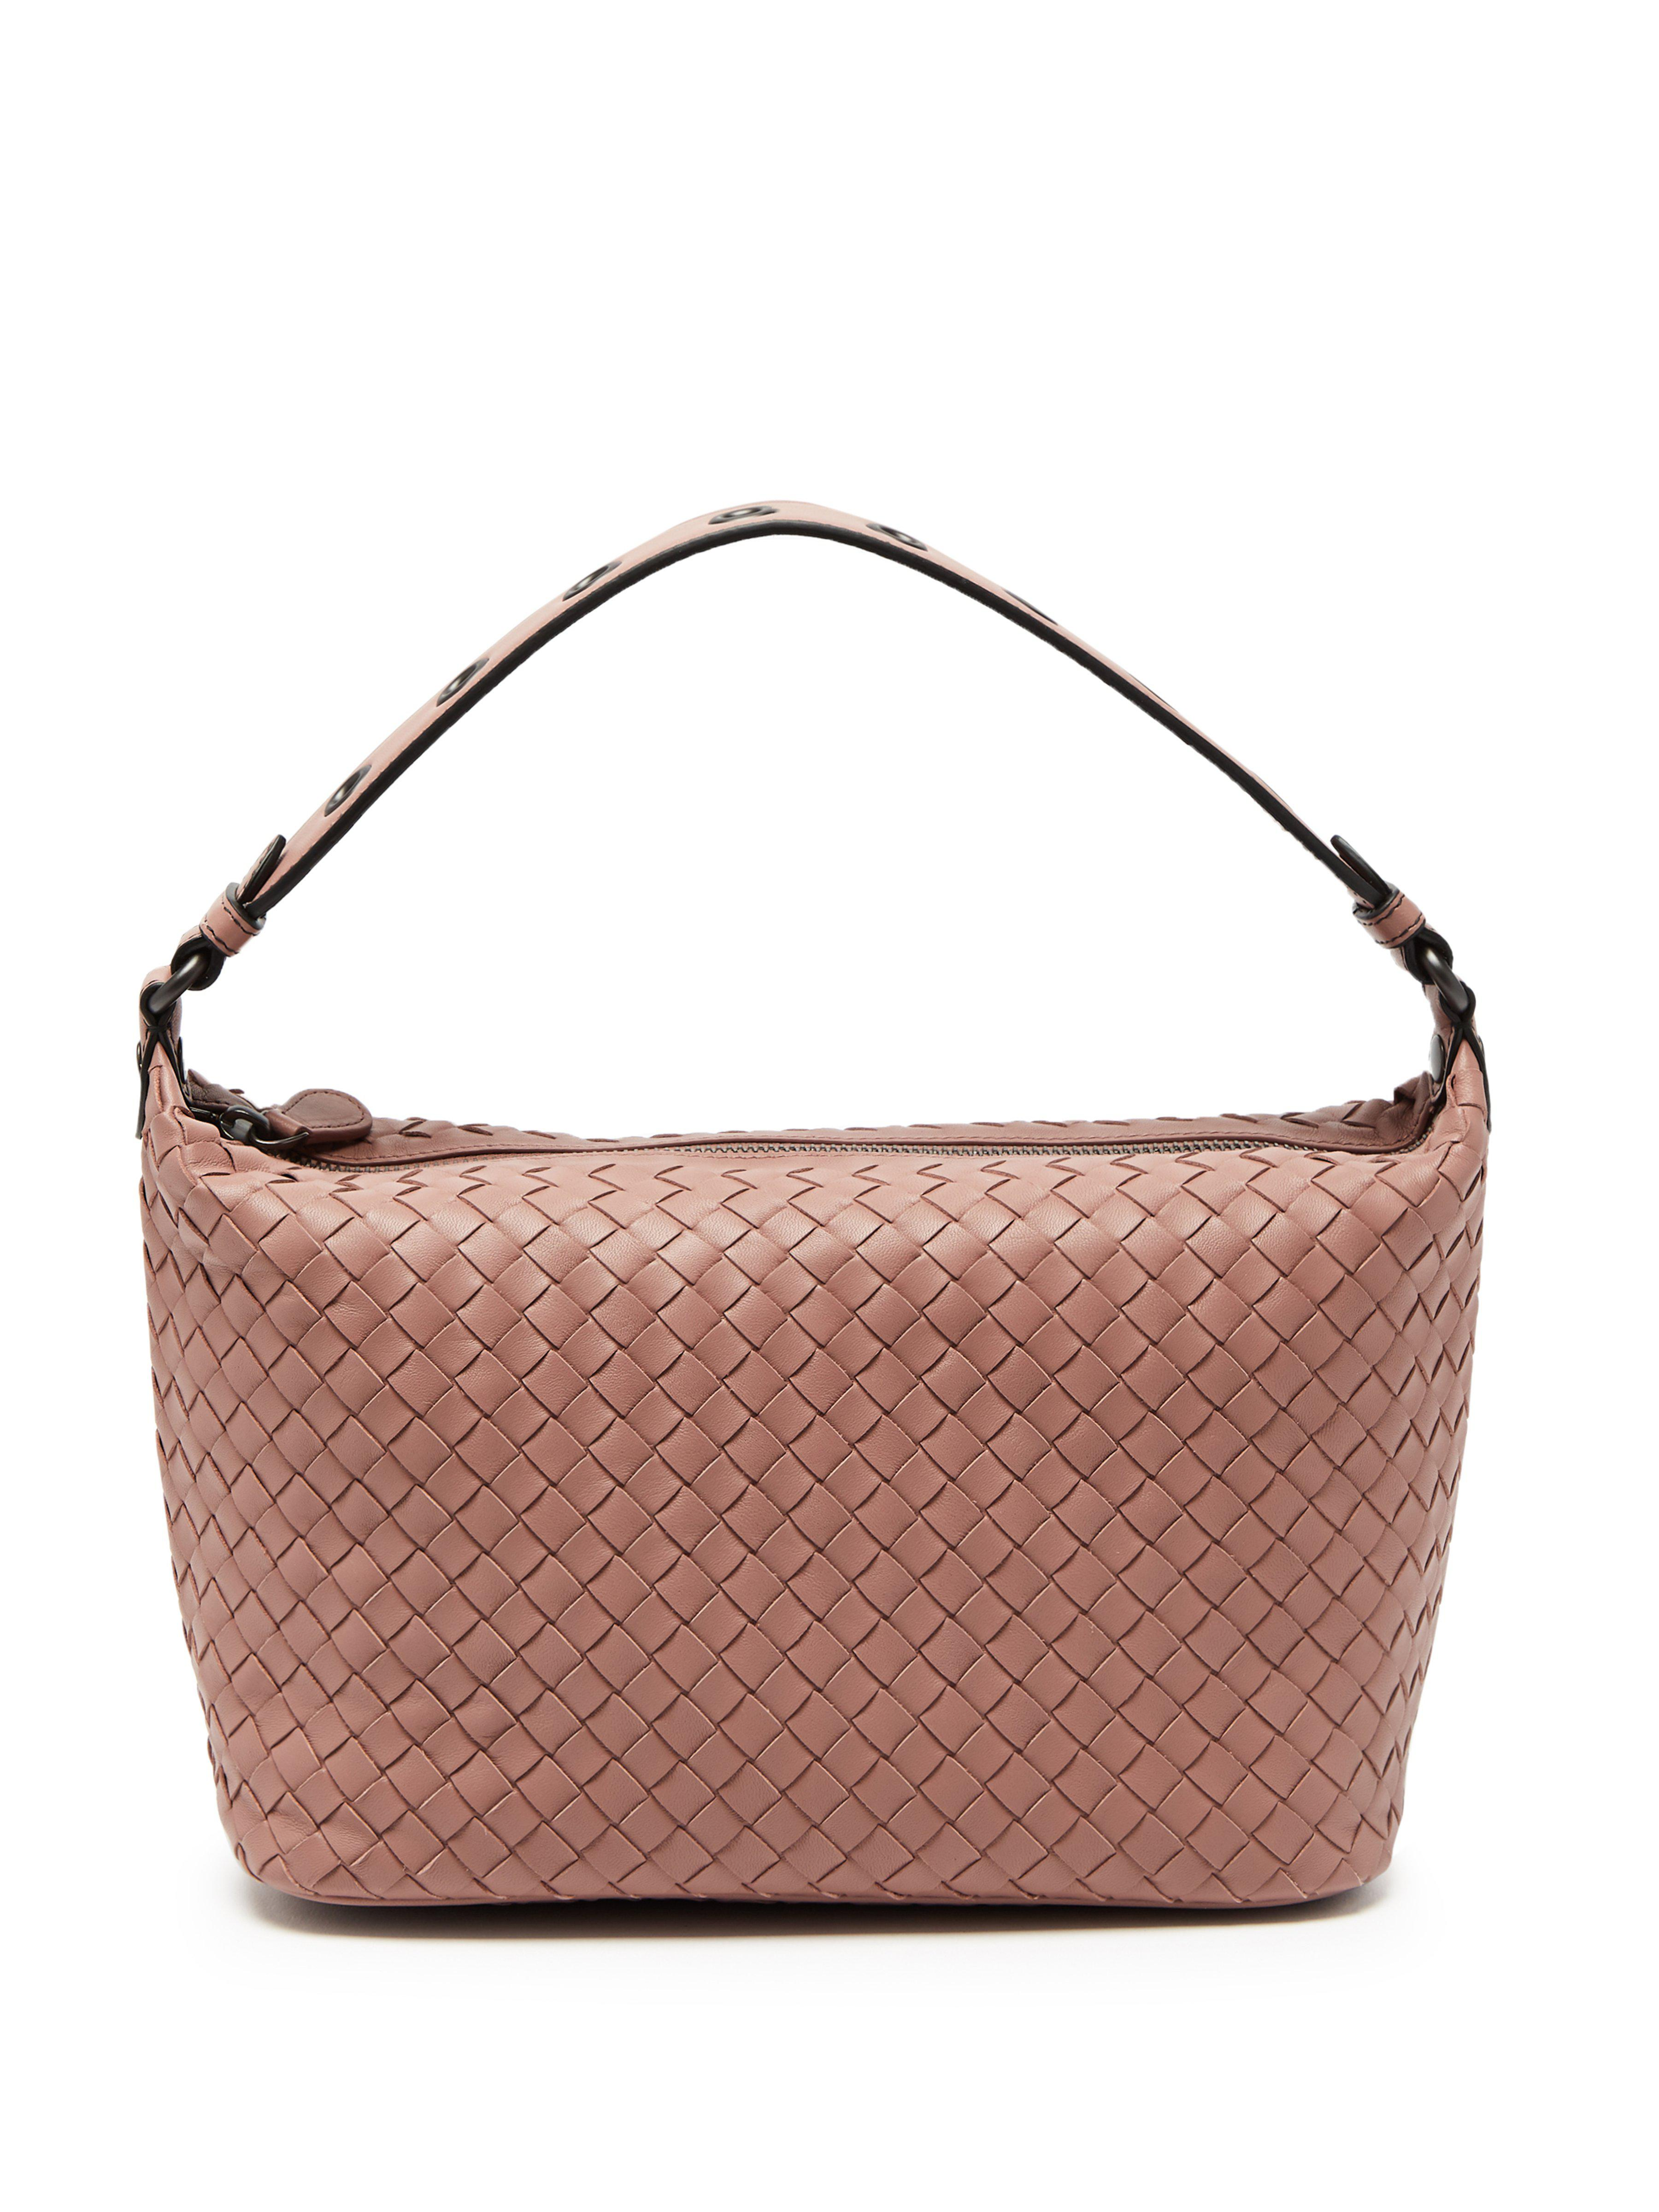 9b8b002a2c0b Bottega Veneta Eyelet Detail Shoulder Bag in Pink - Lyst